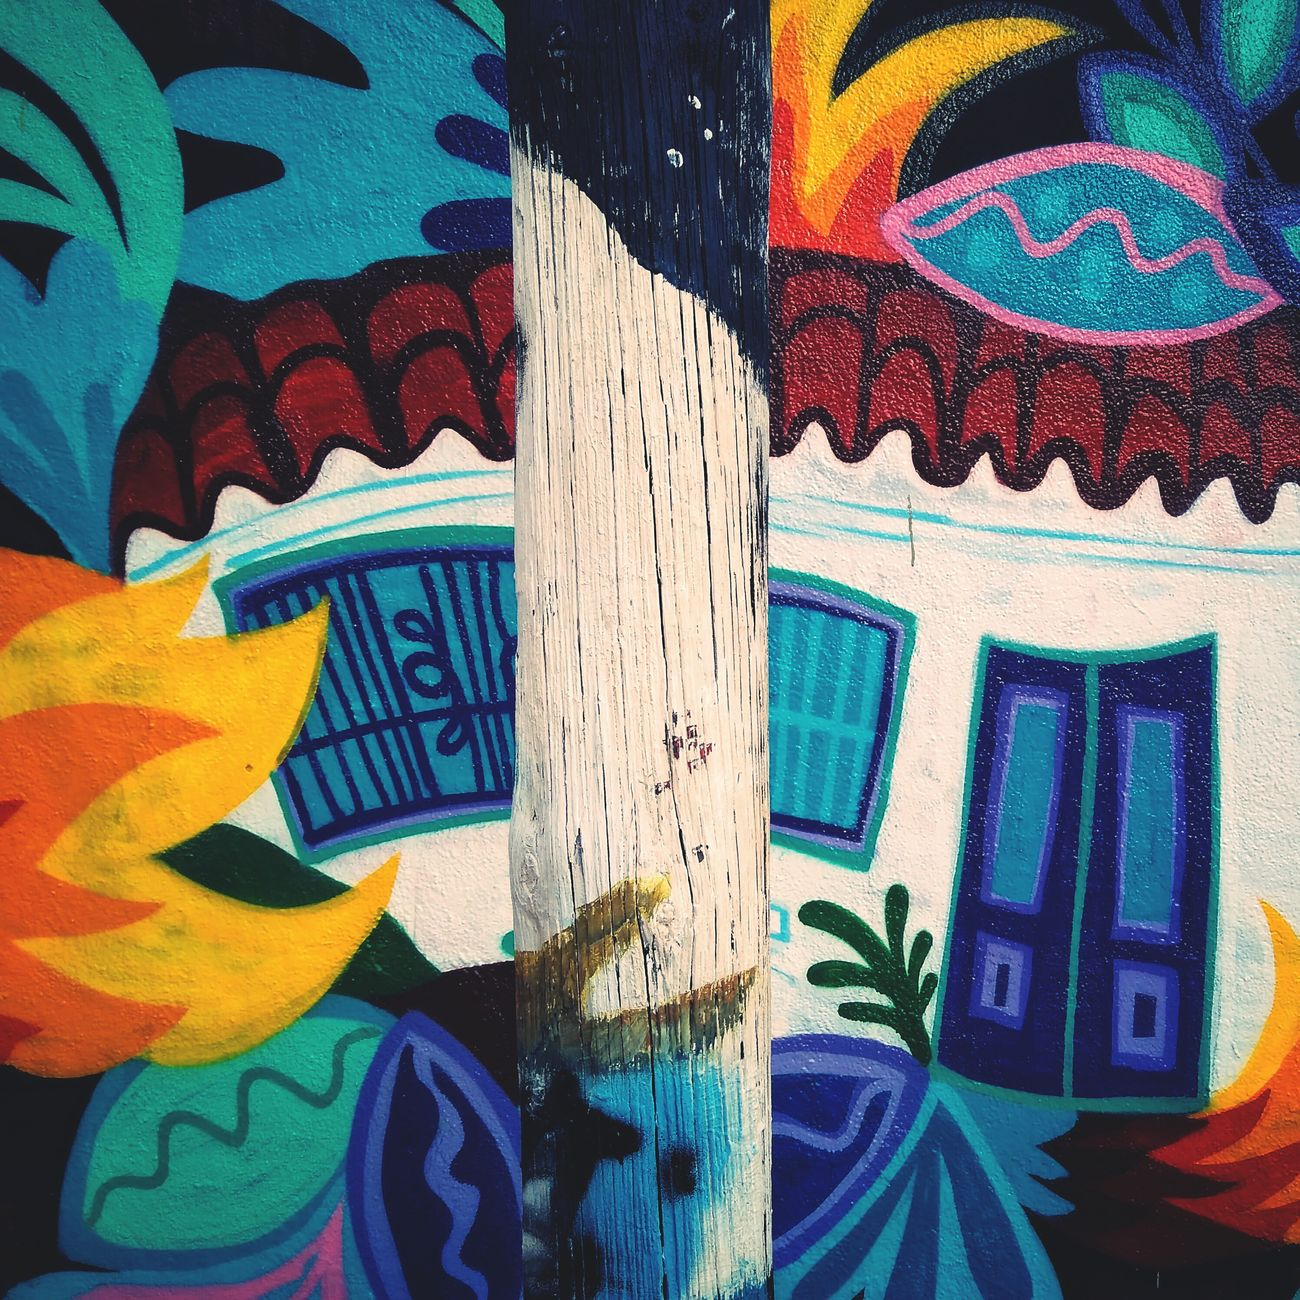 Building Exterior Aquaris Barcelona Mural Art Multi Colored